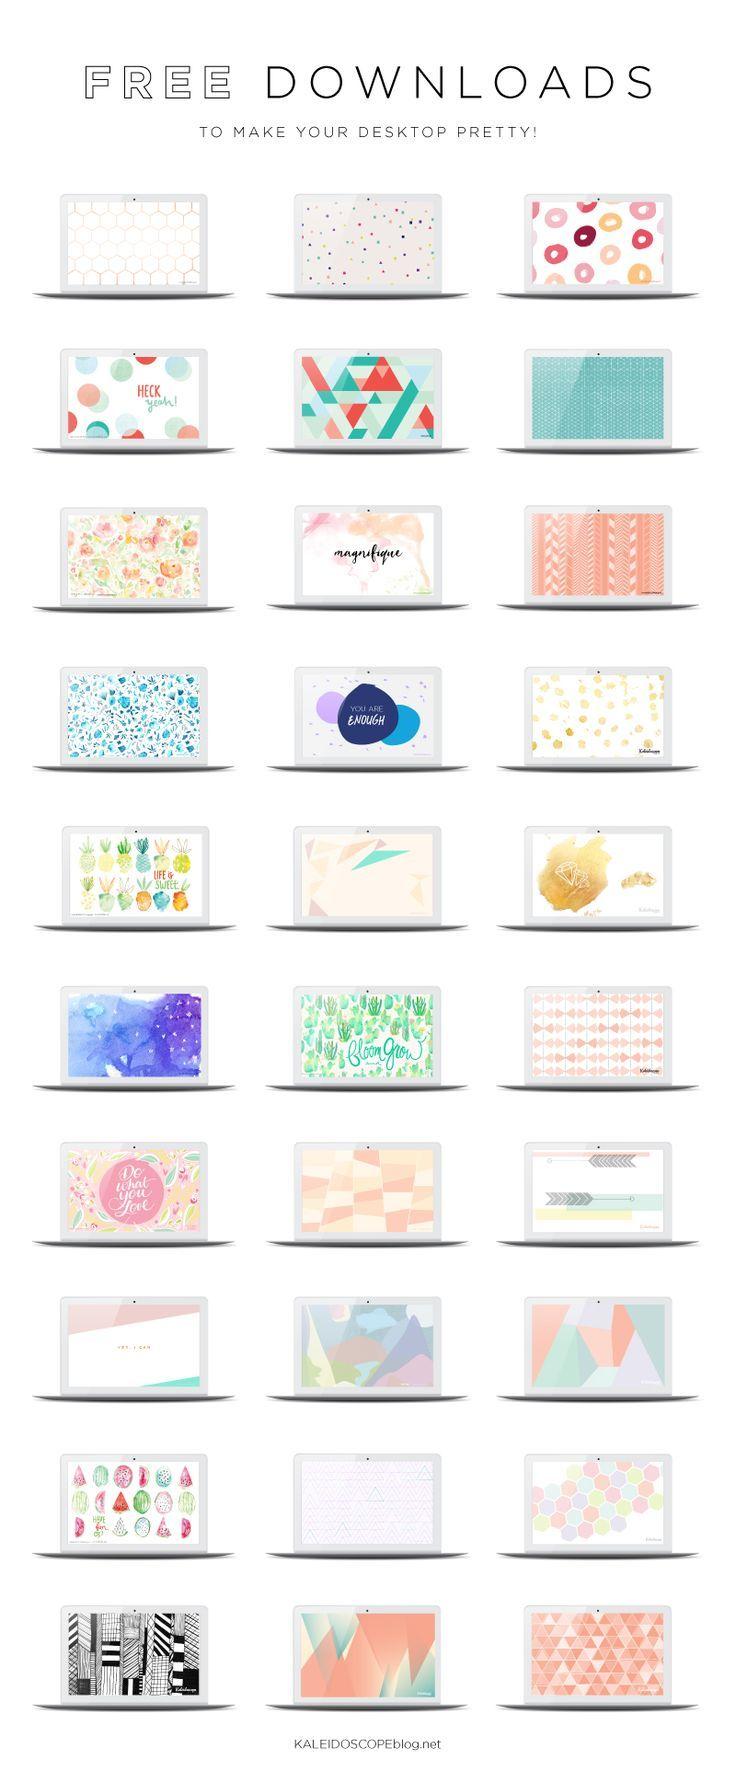 Top Wallpaper Macbook Artsy - 2729d65ec67024101d7b1f48dae7c39c  Collection_904973.jpg